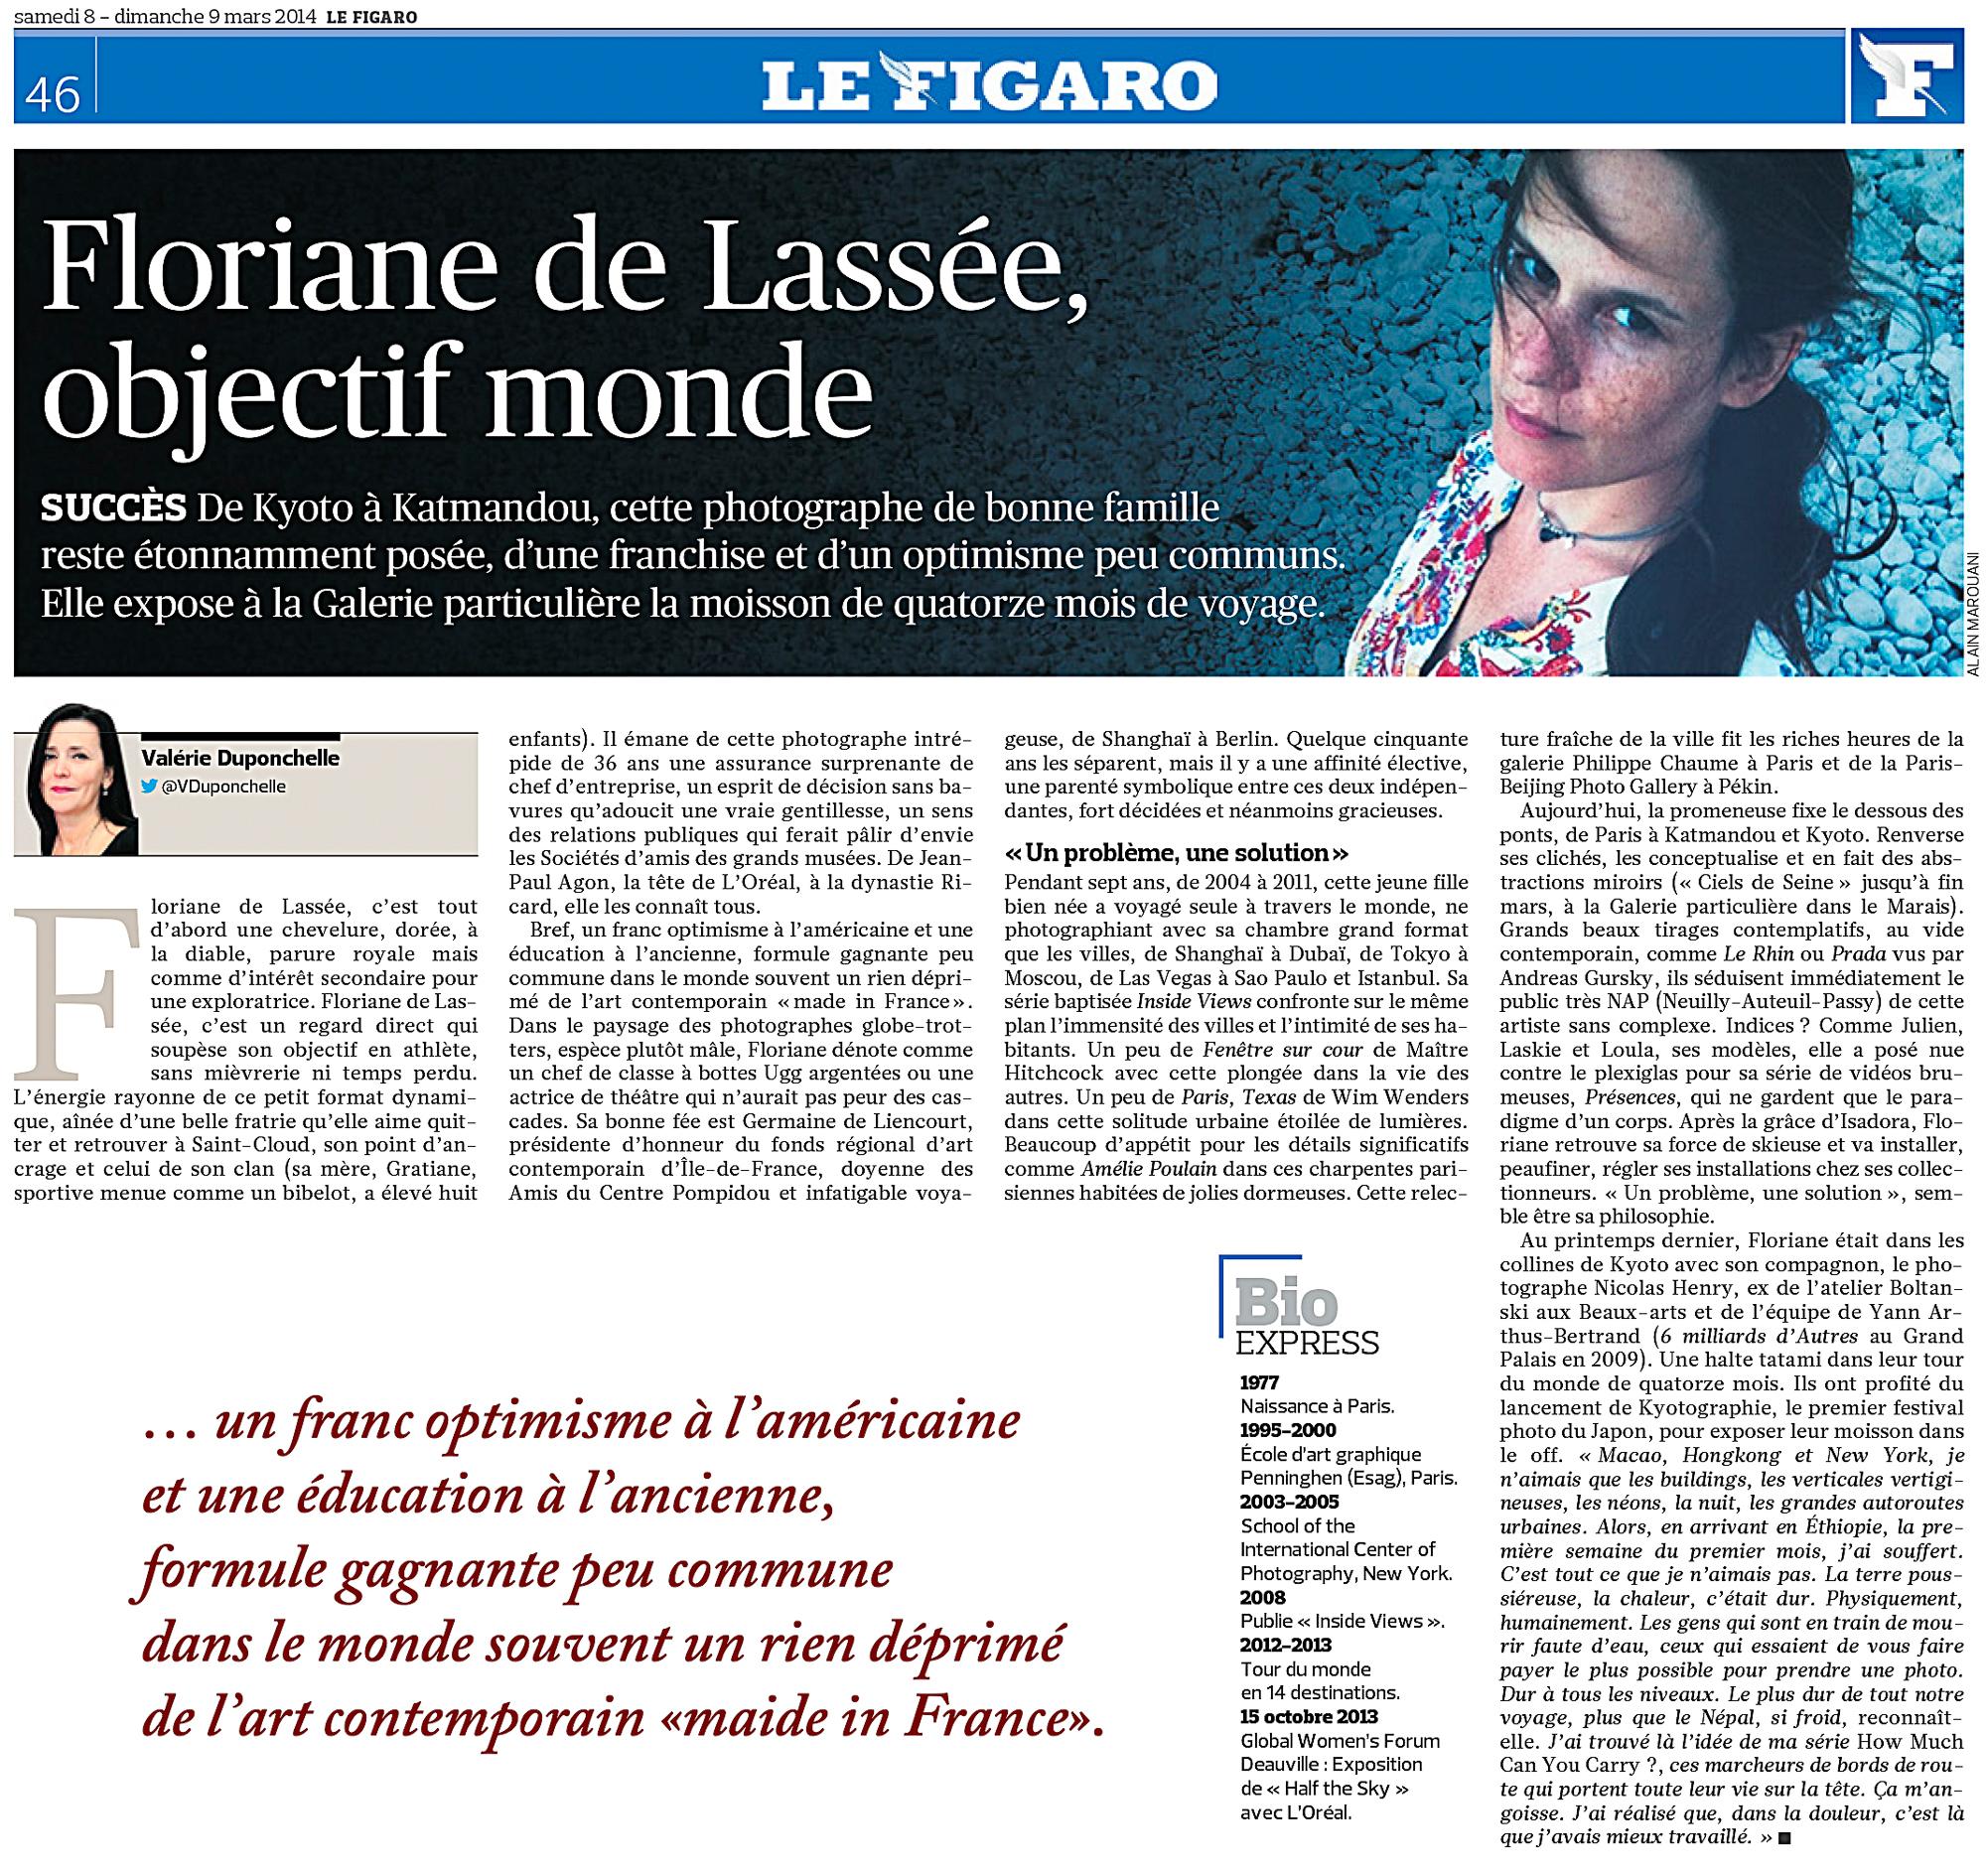 FlorianeDelassee_About_lefigarocitation_01.jpg